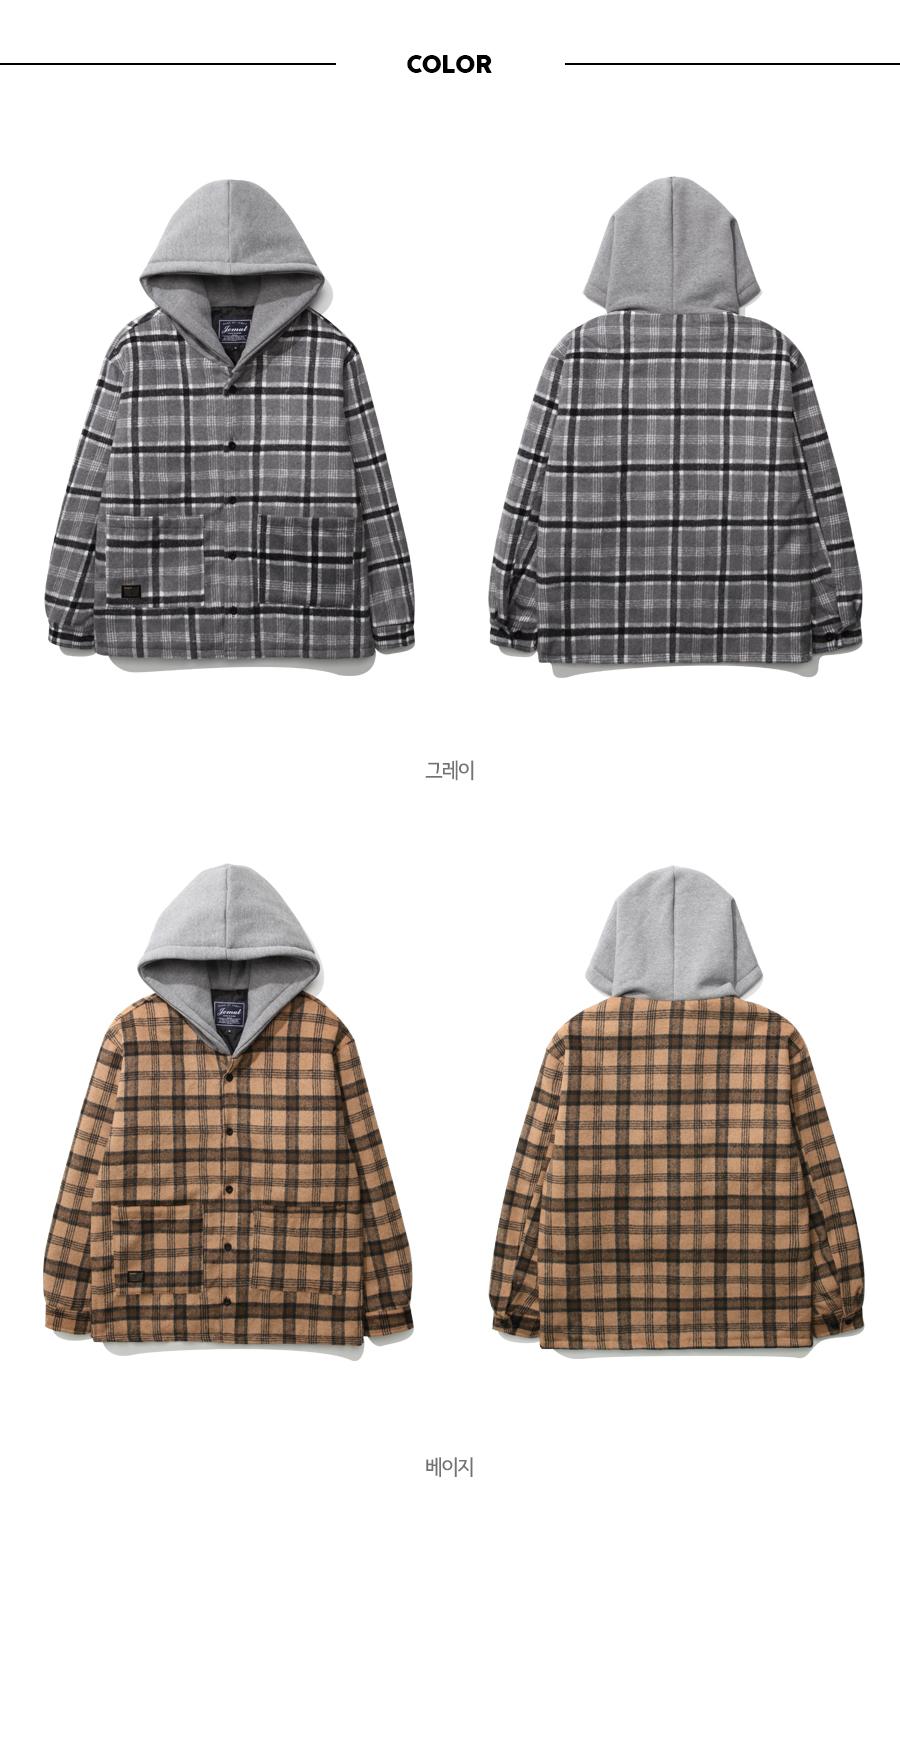 20181012_mousse_wool_jacket_color_yh.jpg